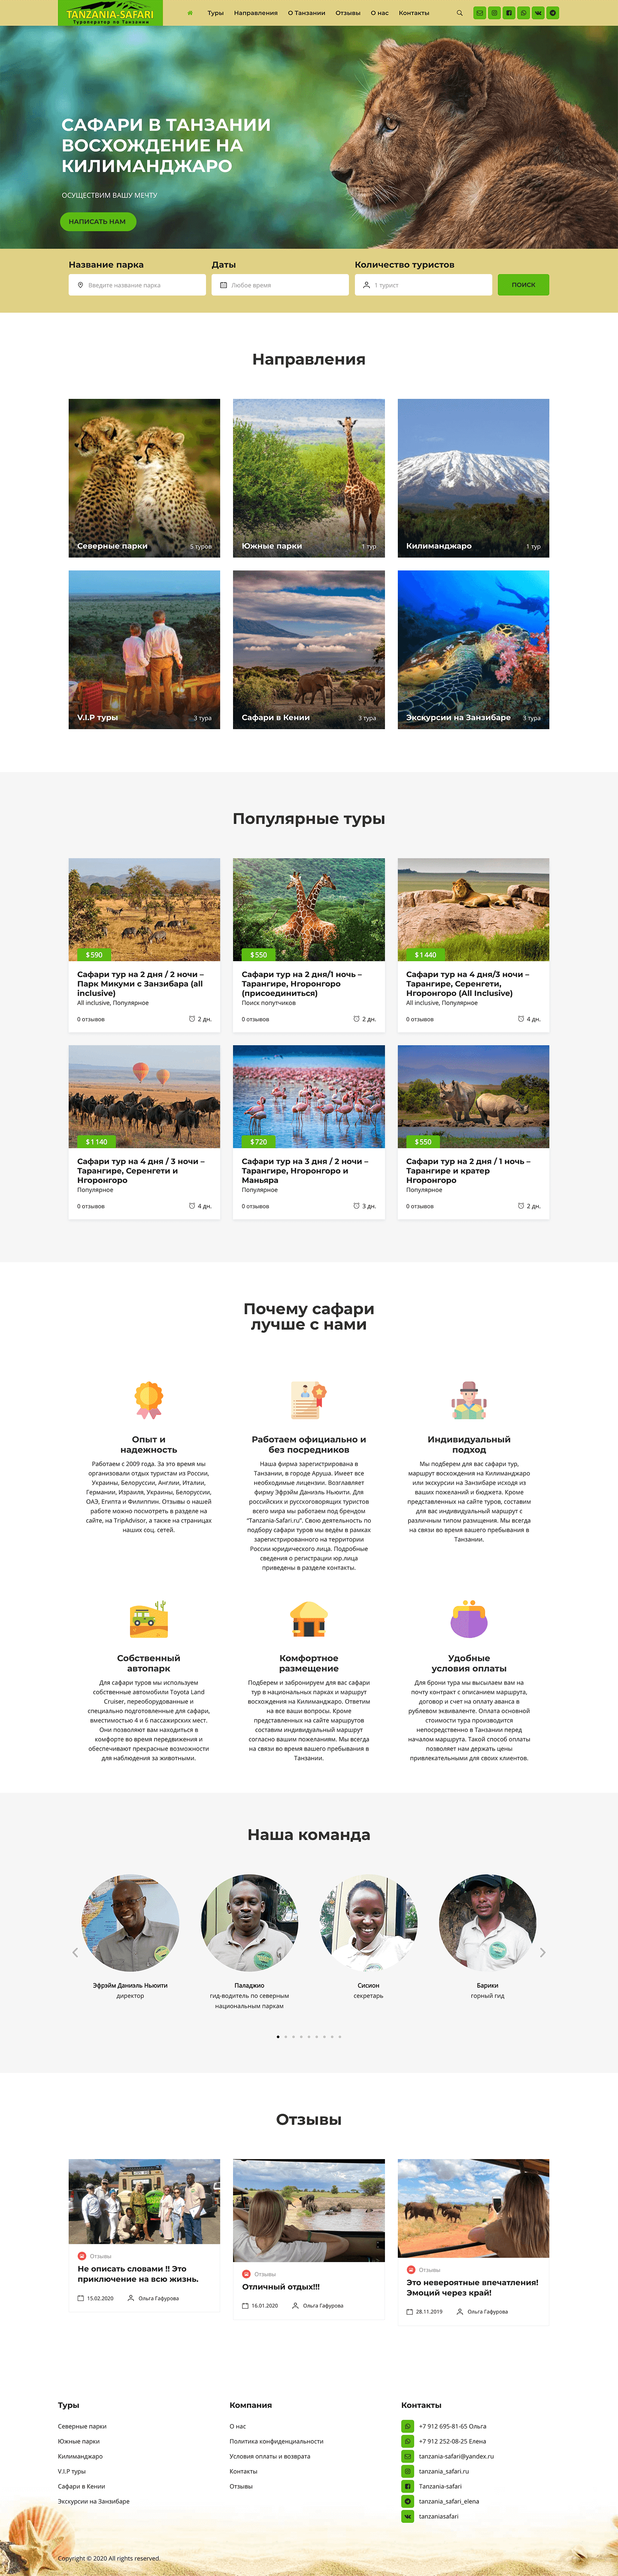 https://danilin.biz/wp-content/uploads/2021/09/tanzania-safari.png